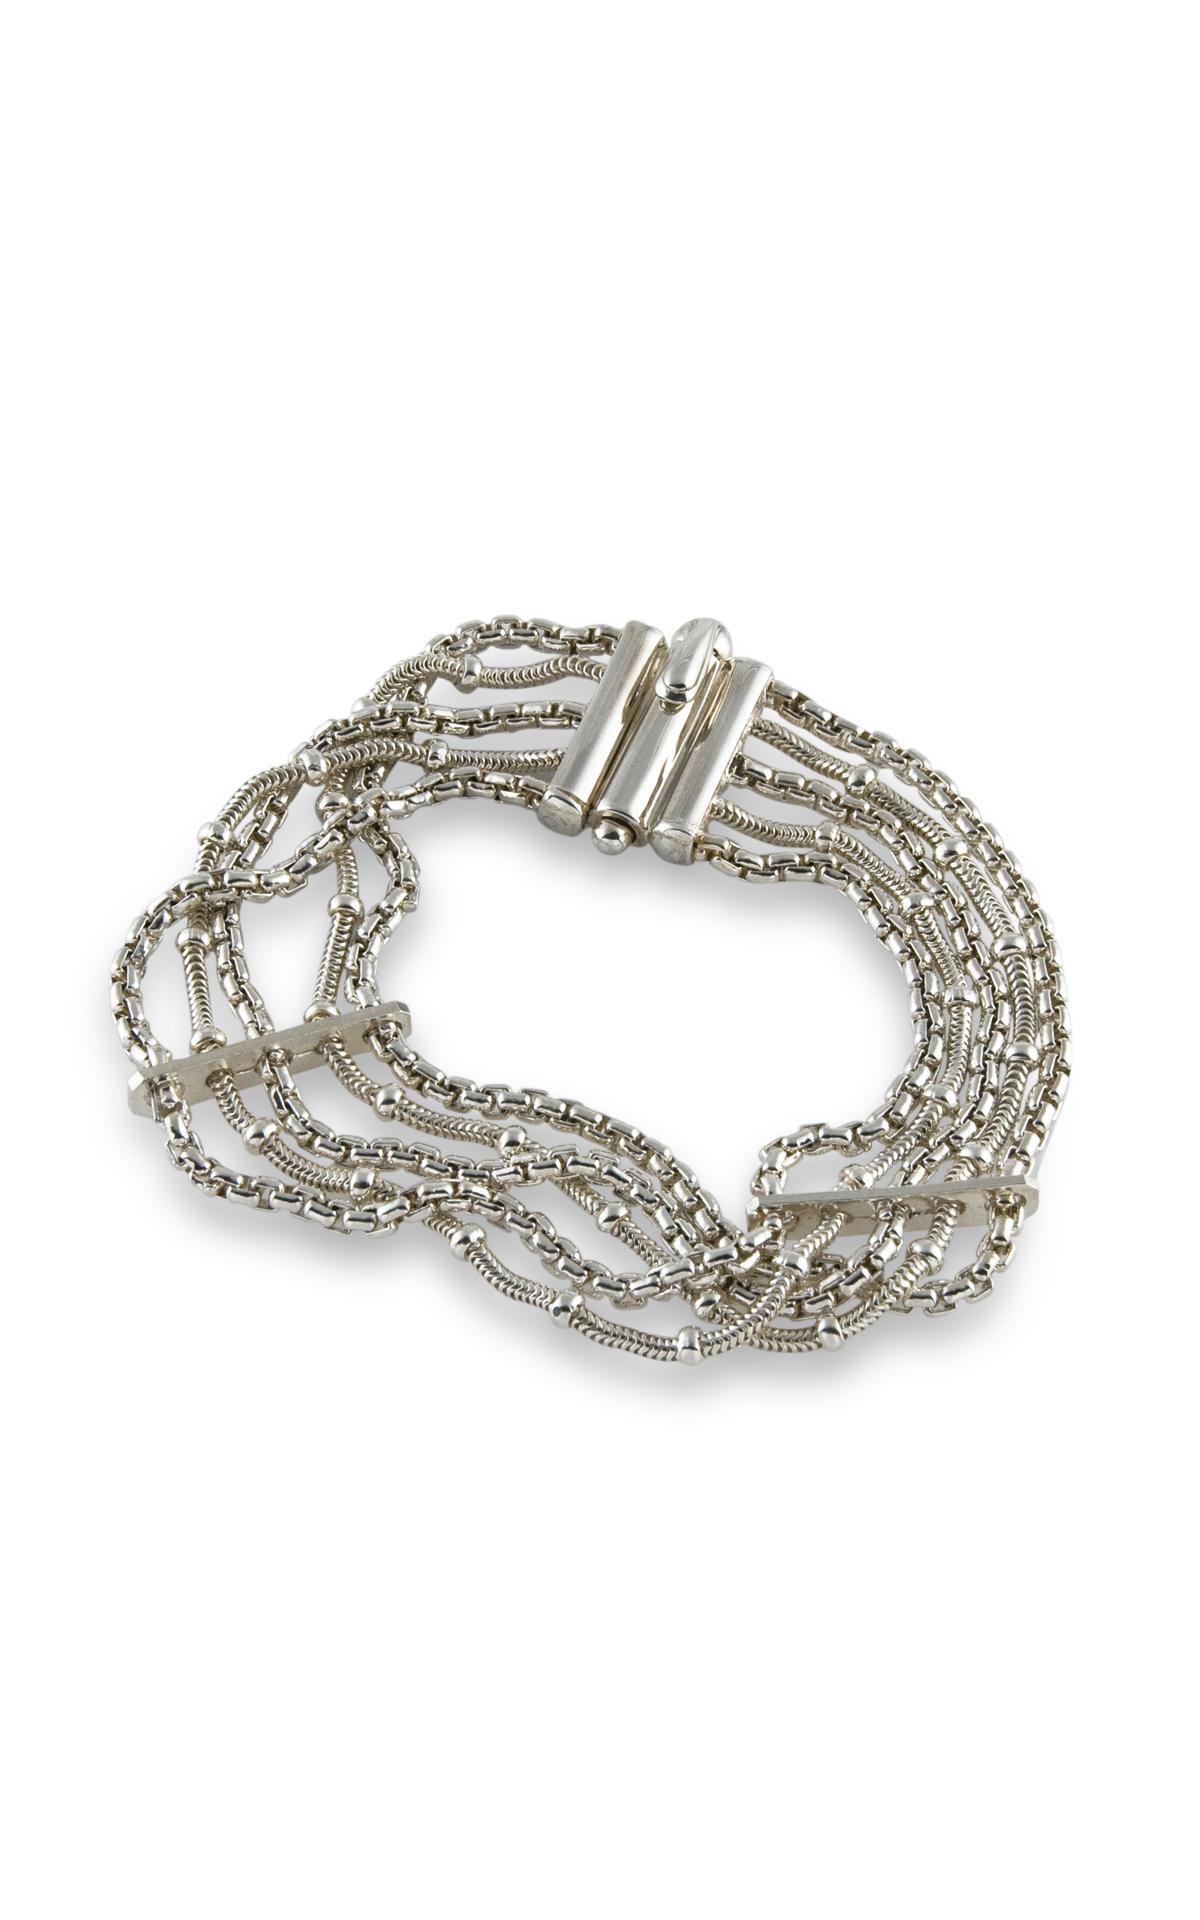 Zina Contemporary Bracelet A891-7 product image